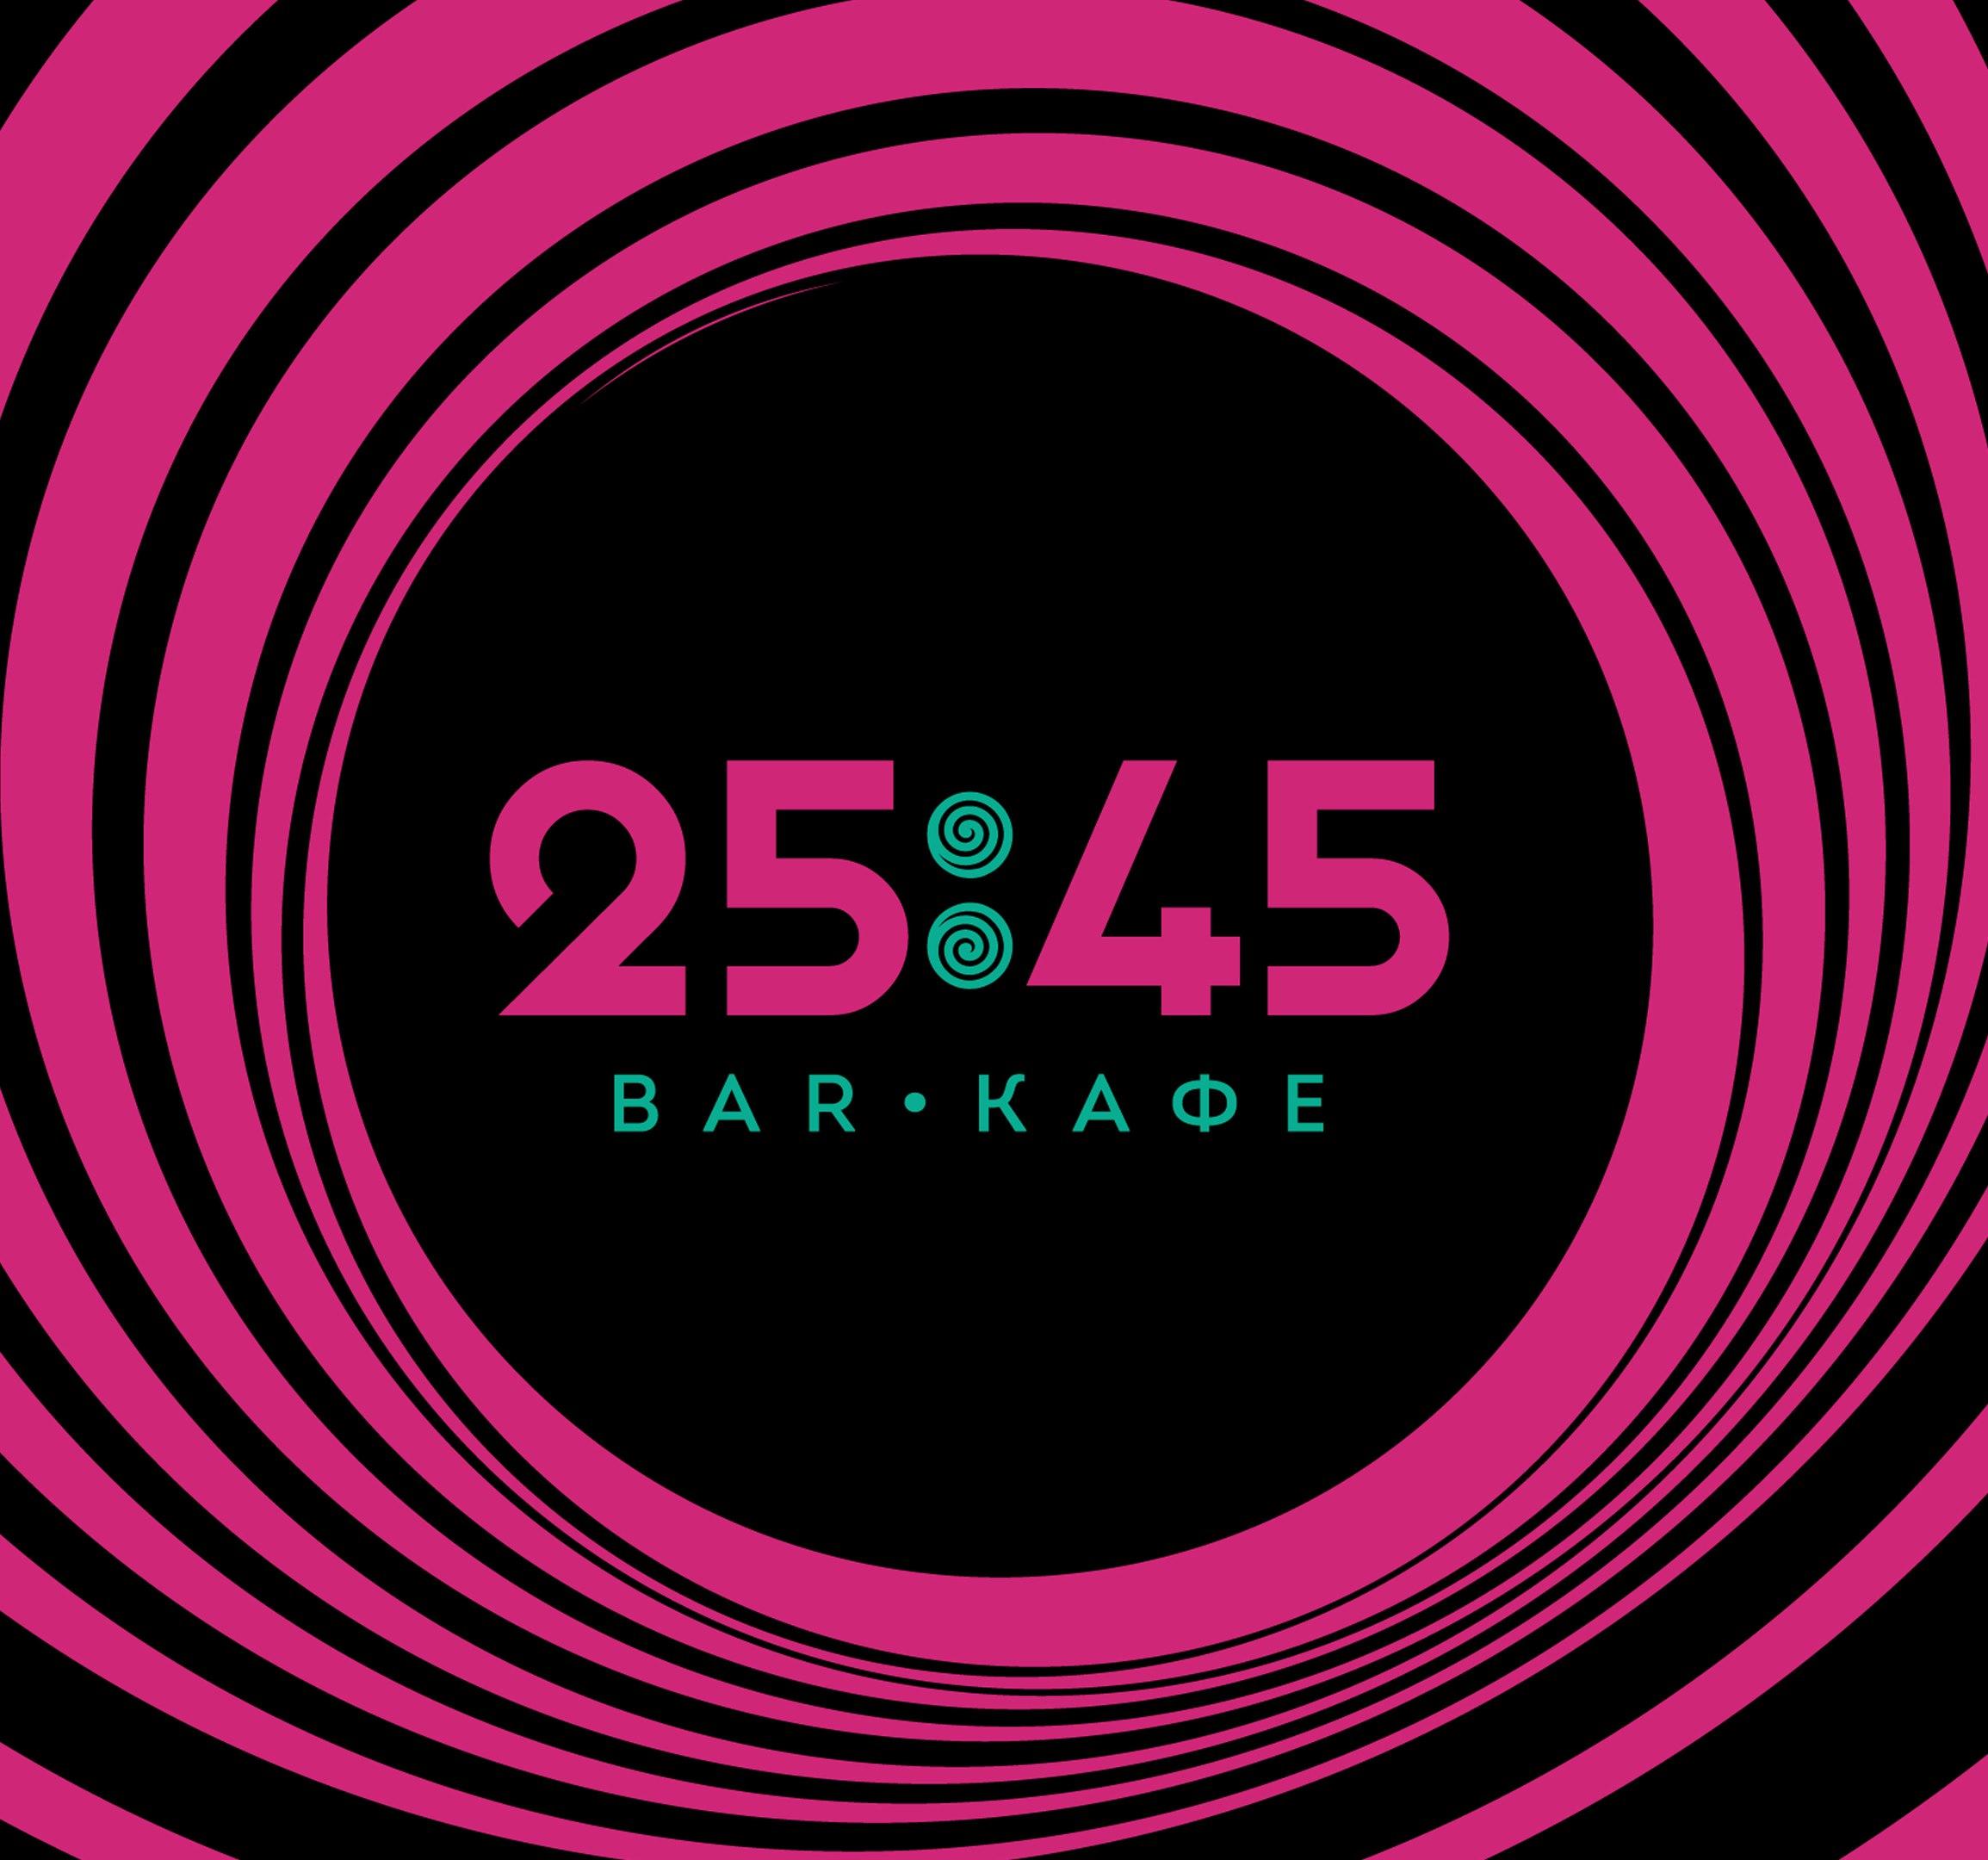 Логотип площадки Спорт-бар 25:45